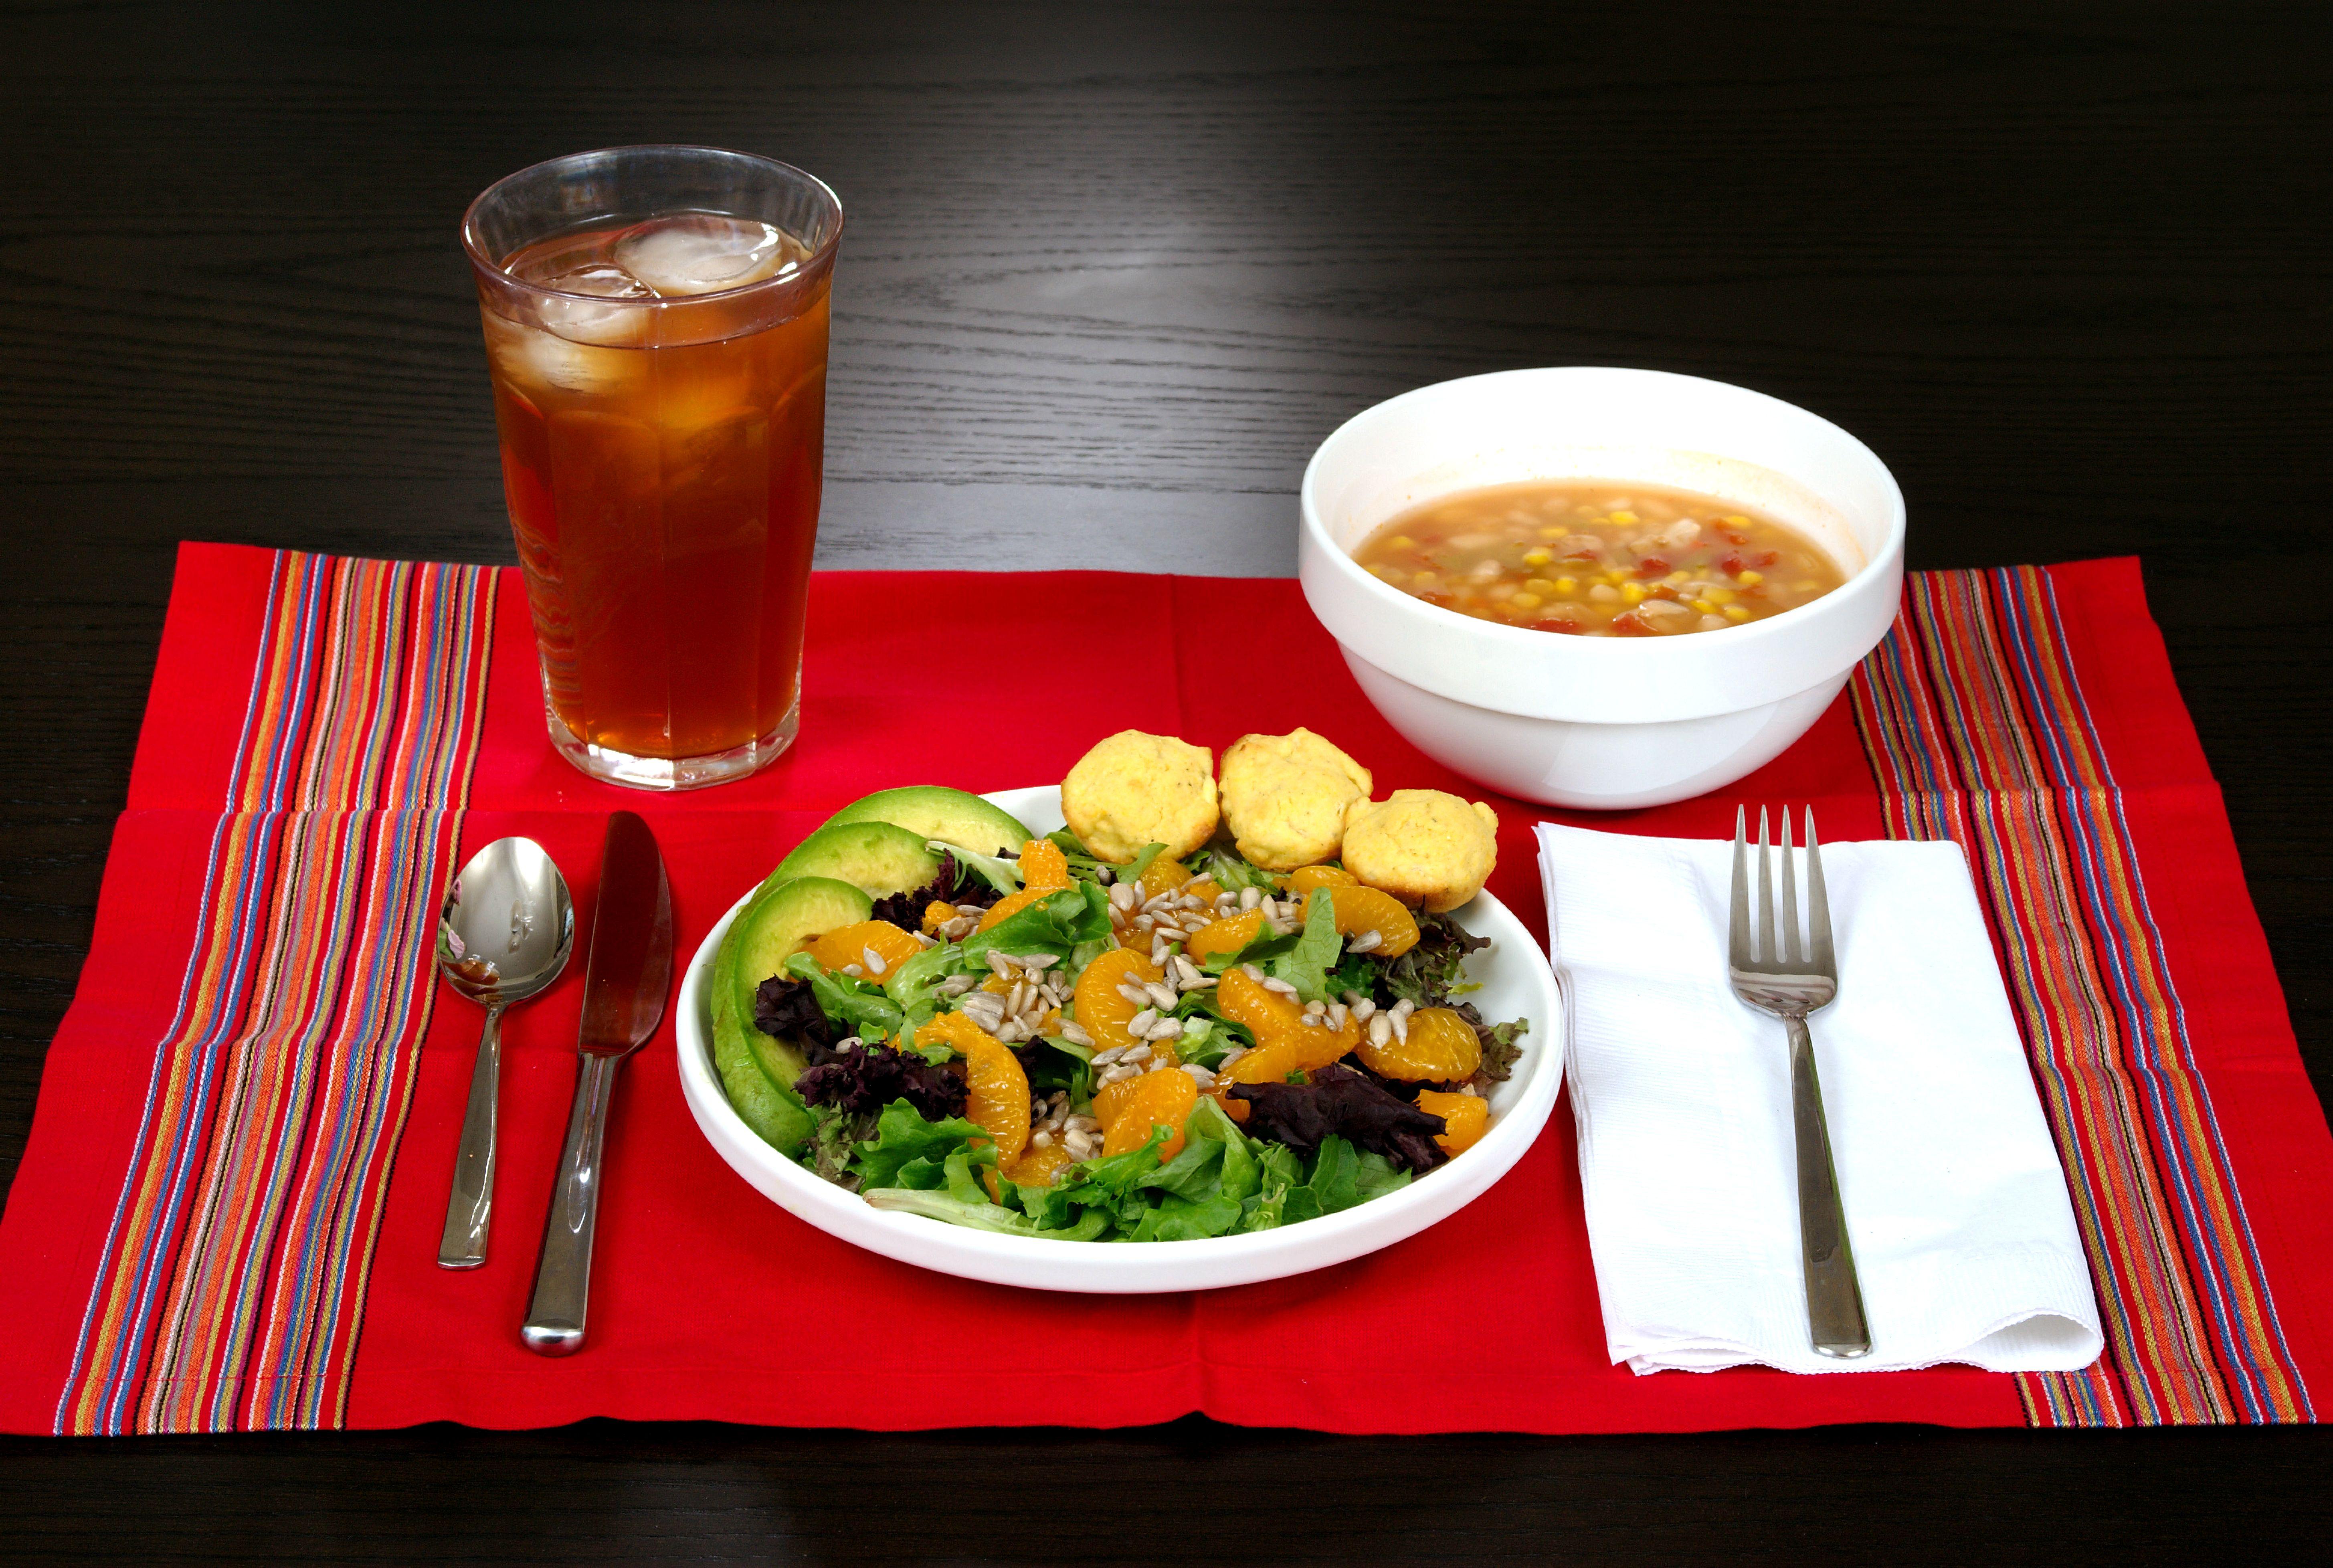 healthy meal nutrient ingredients corn soup bean dense packed menu food included drink domain